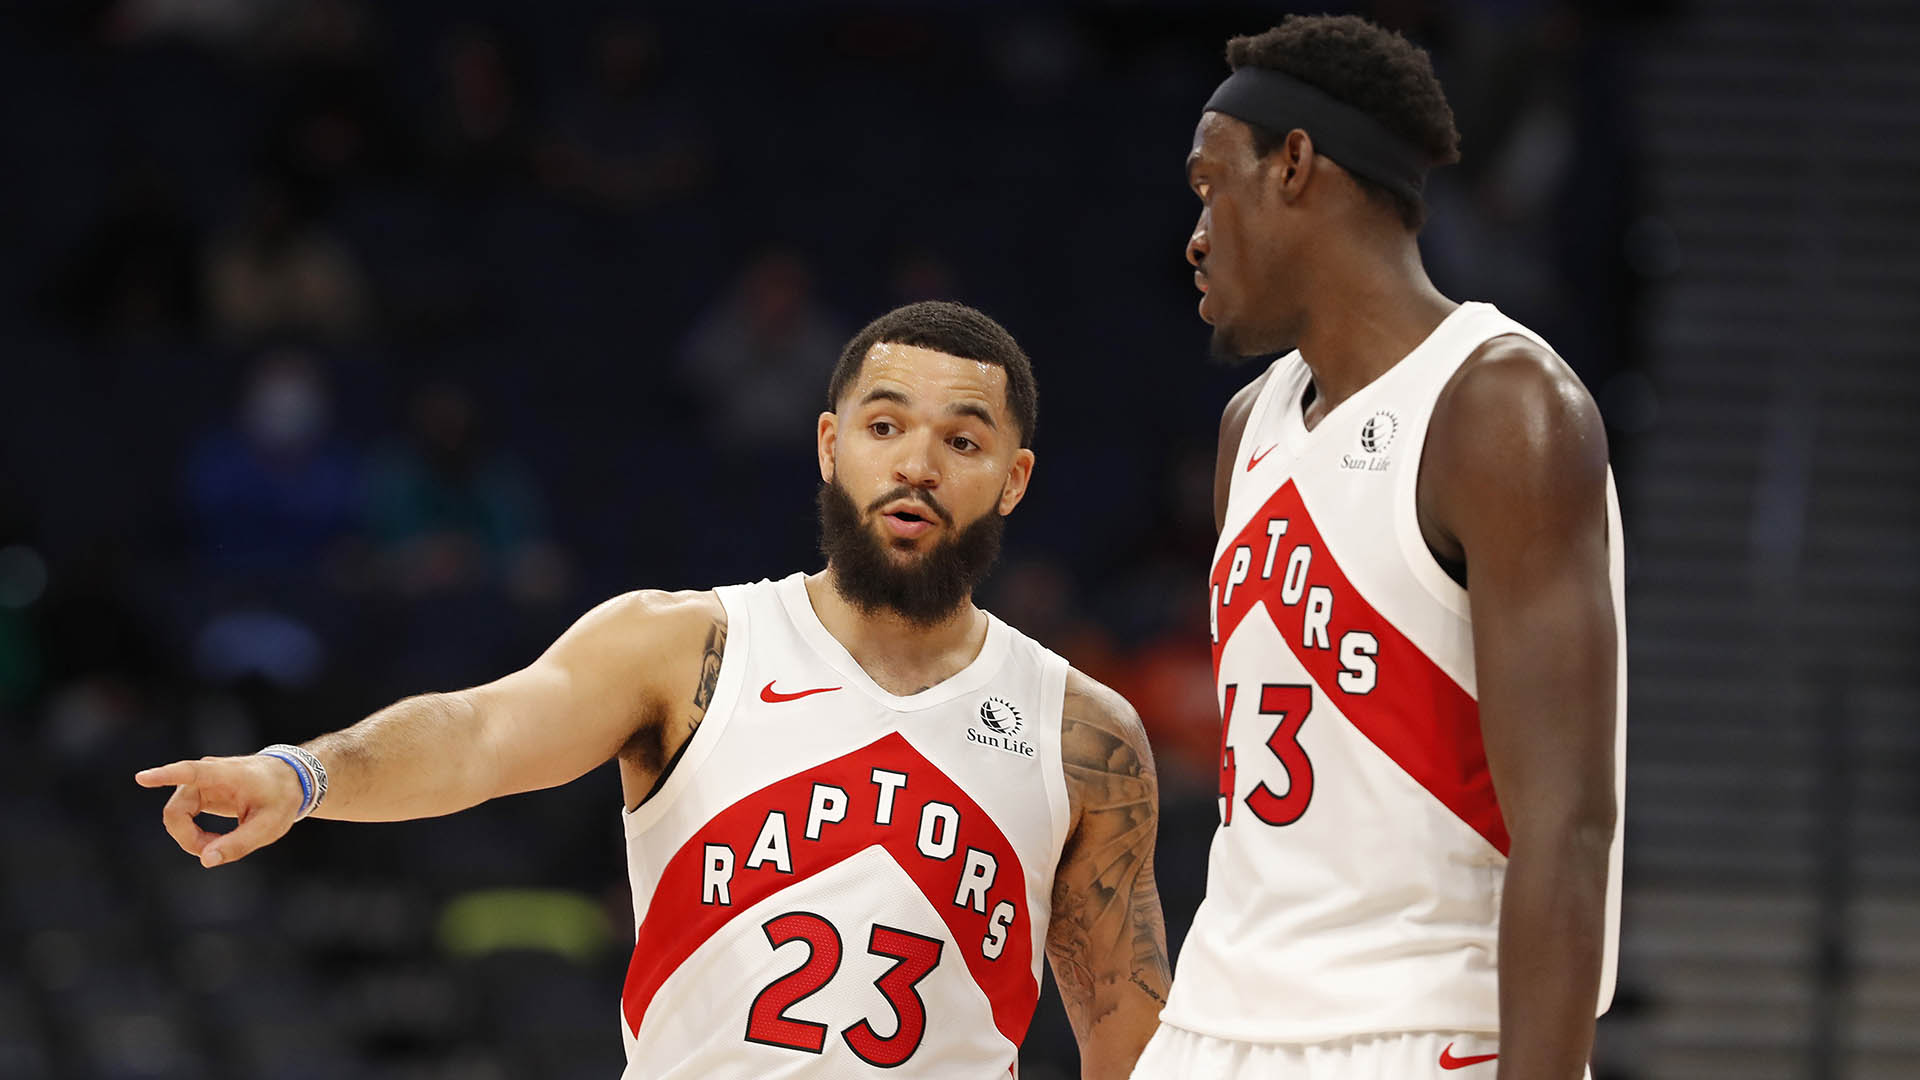 2021 Midseason report: Toronto Raptors